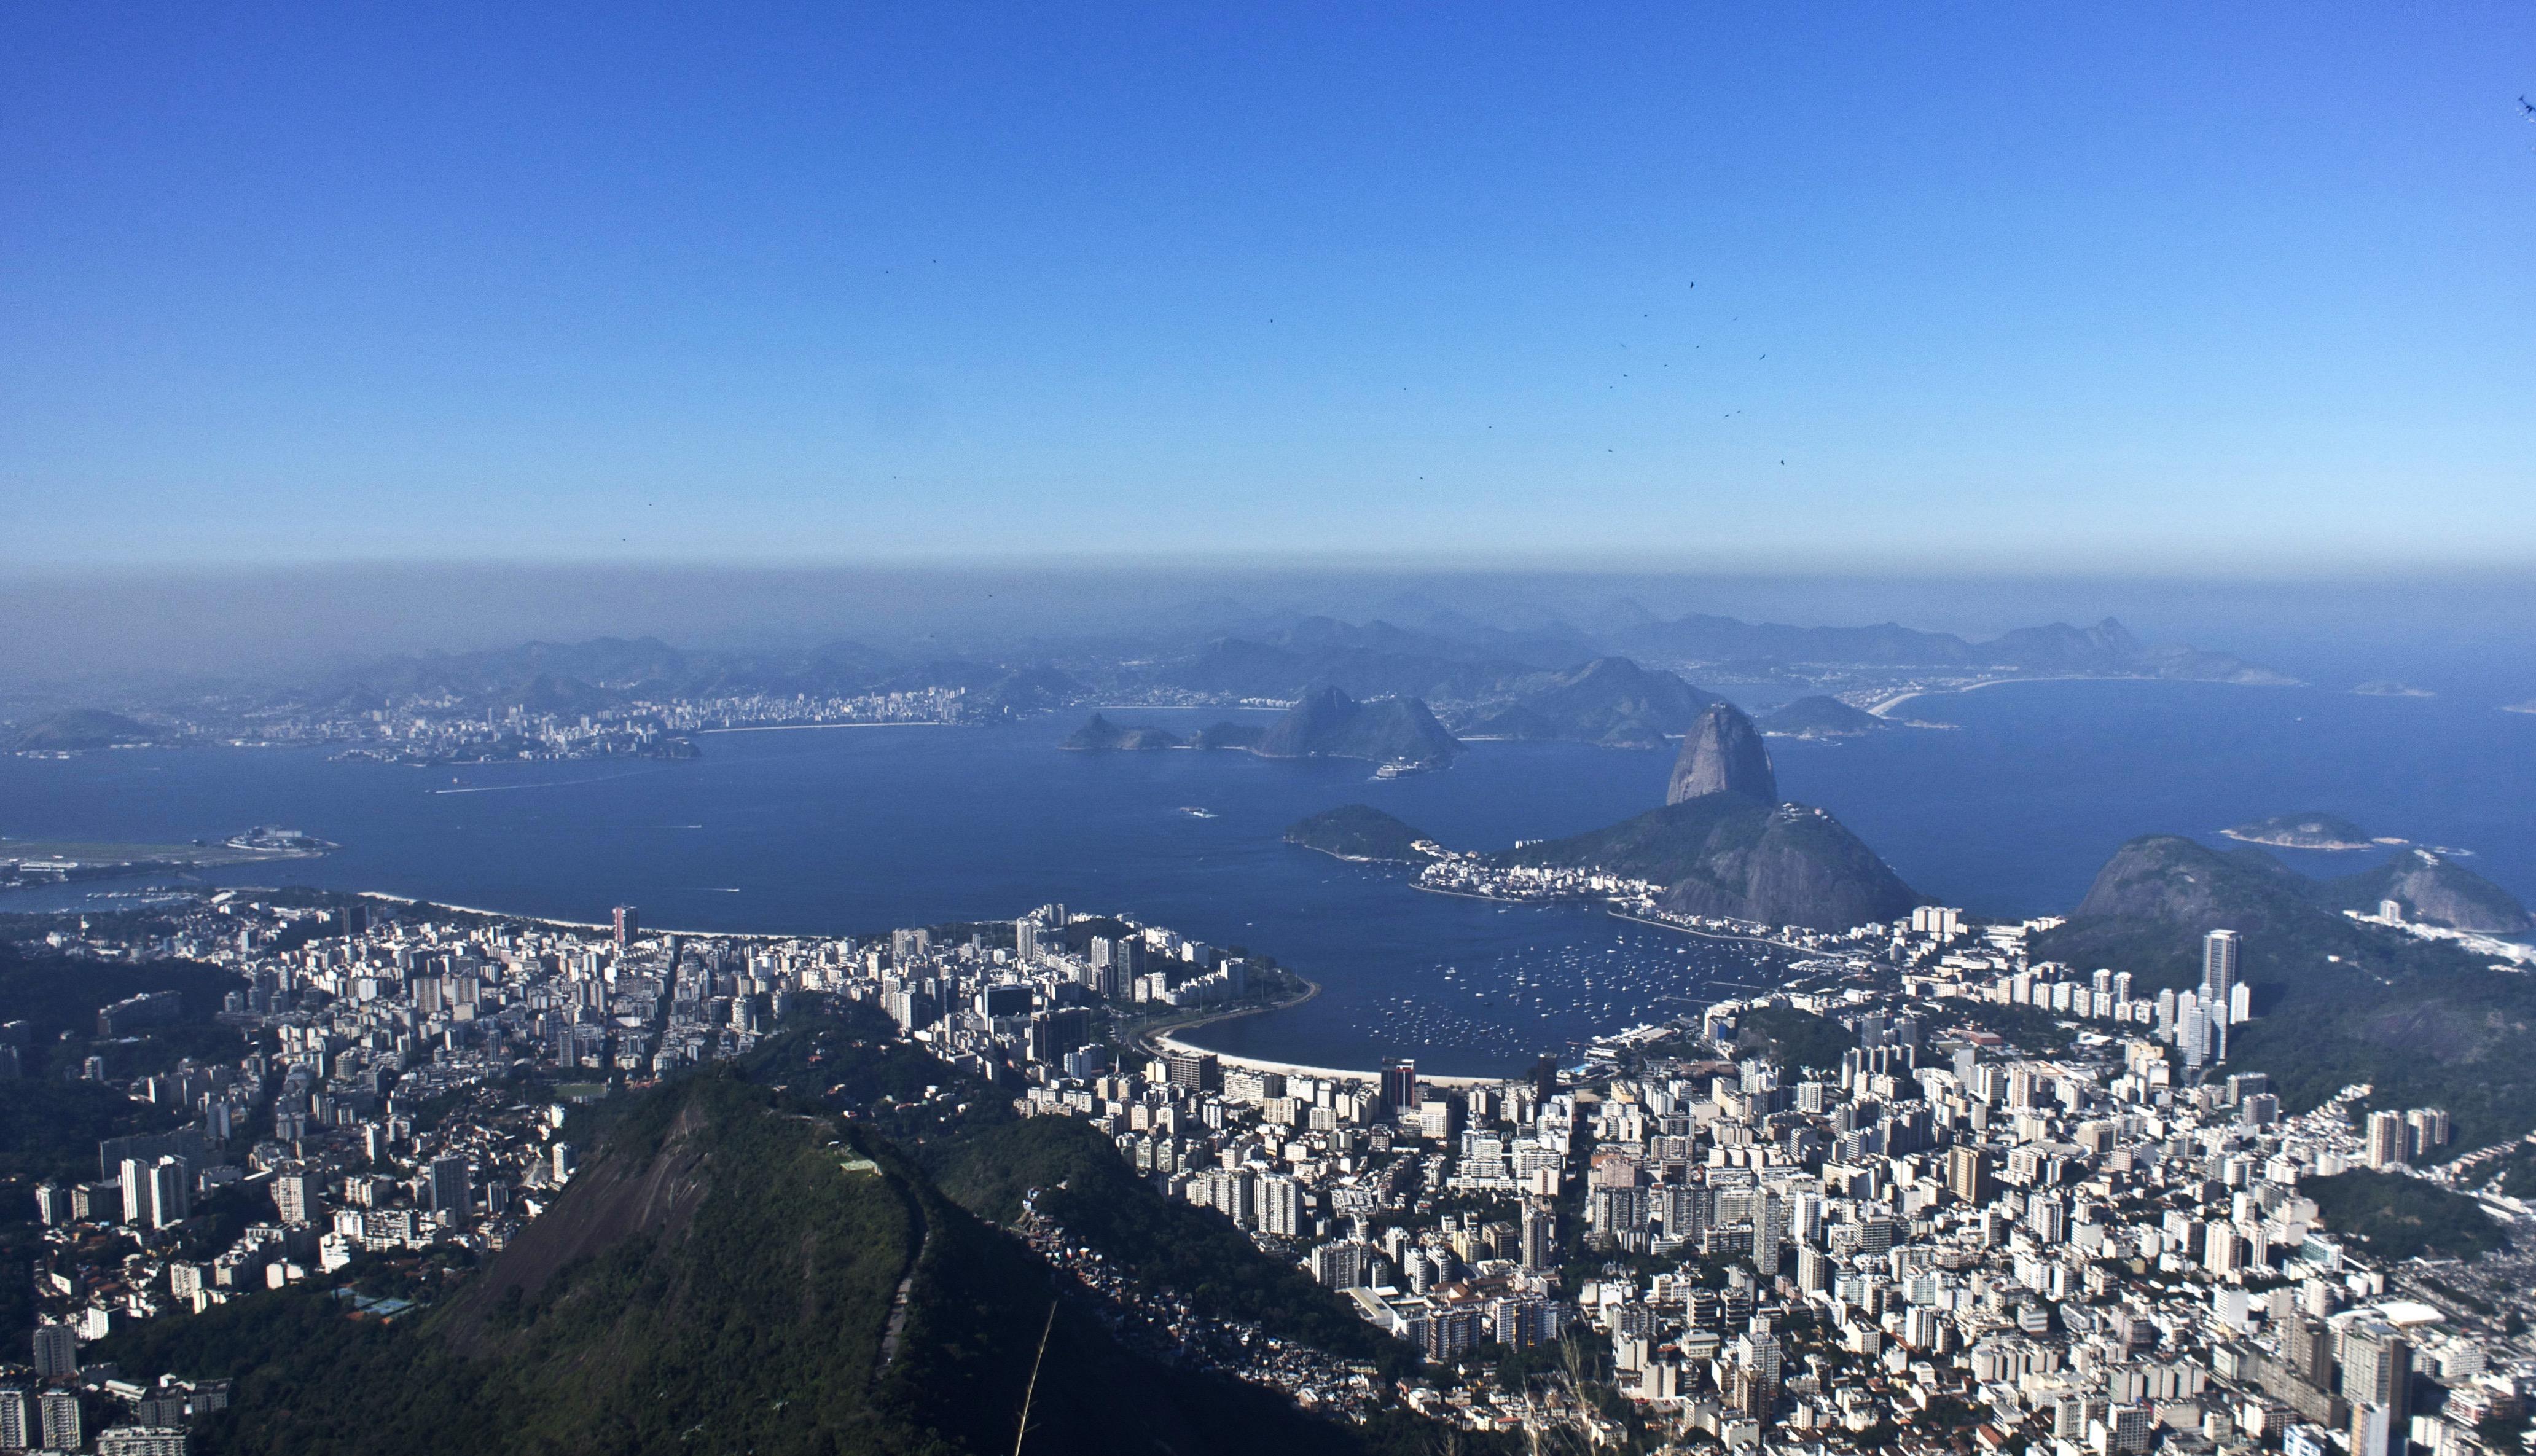 A work by Does - Does rio de Janeiro brazil 2013 skyline